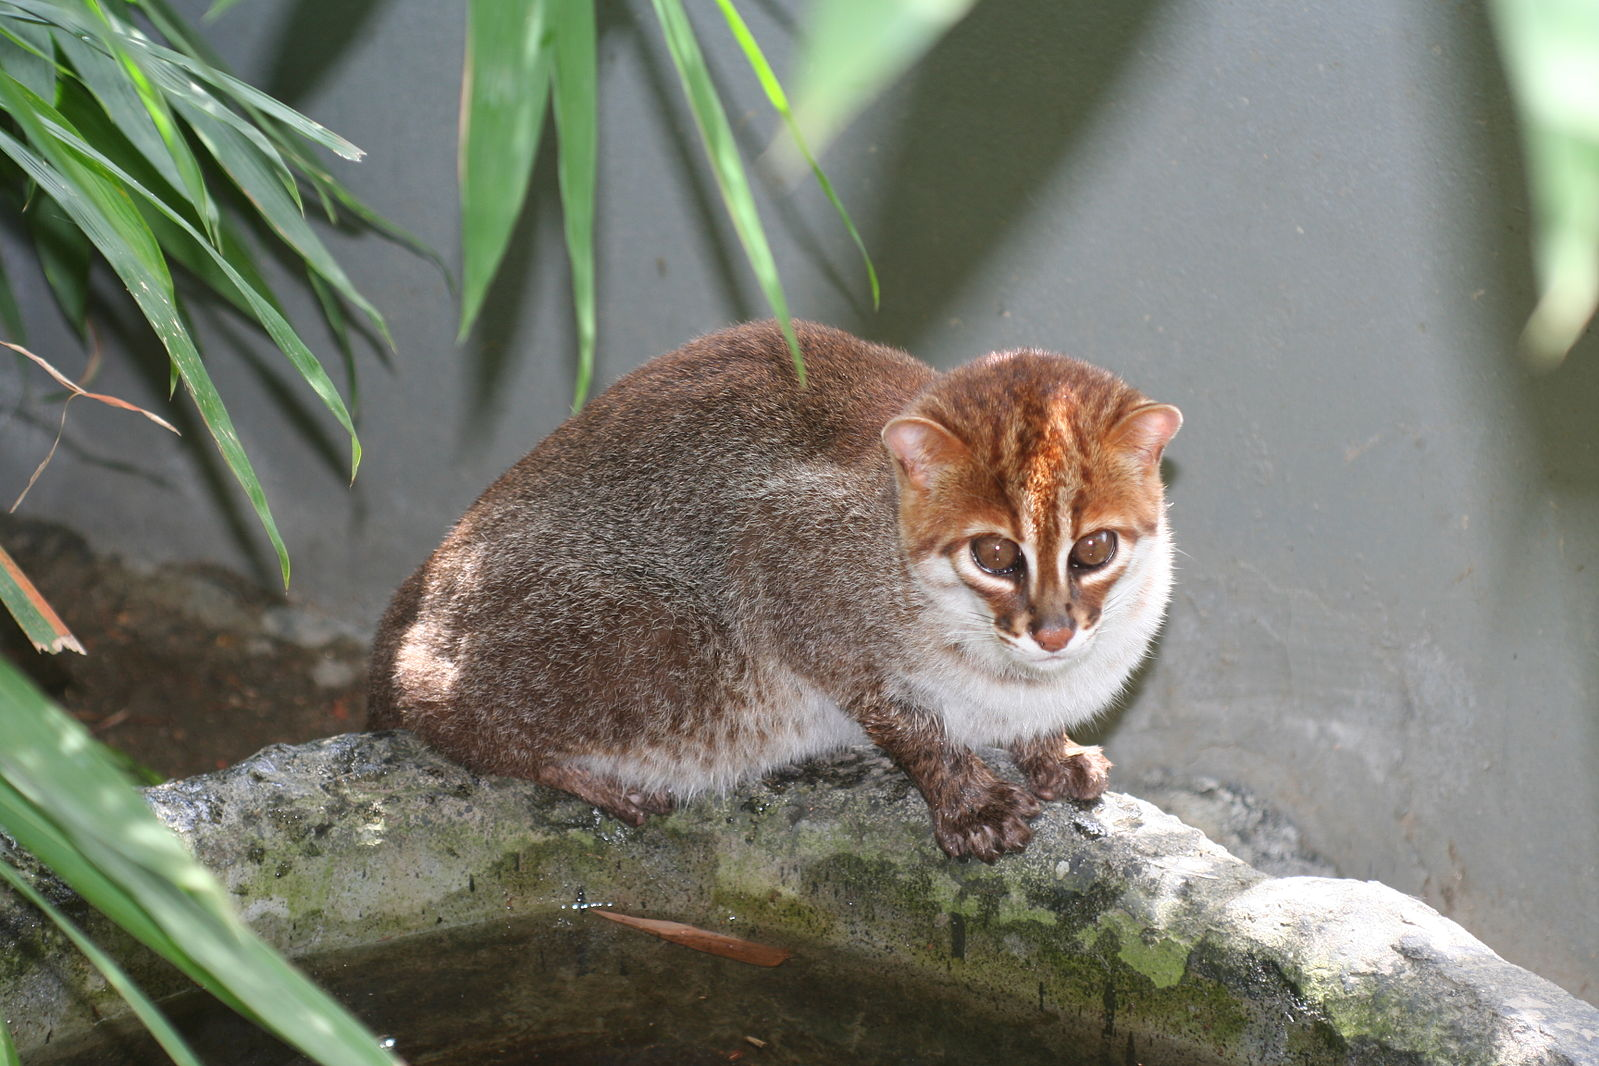 Flat-headed_cat_1_Jim_Sanderson.JPG